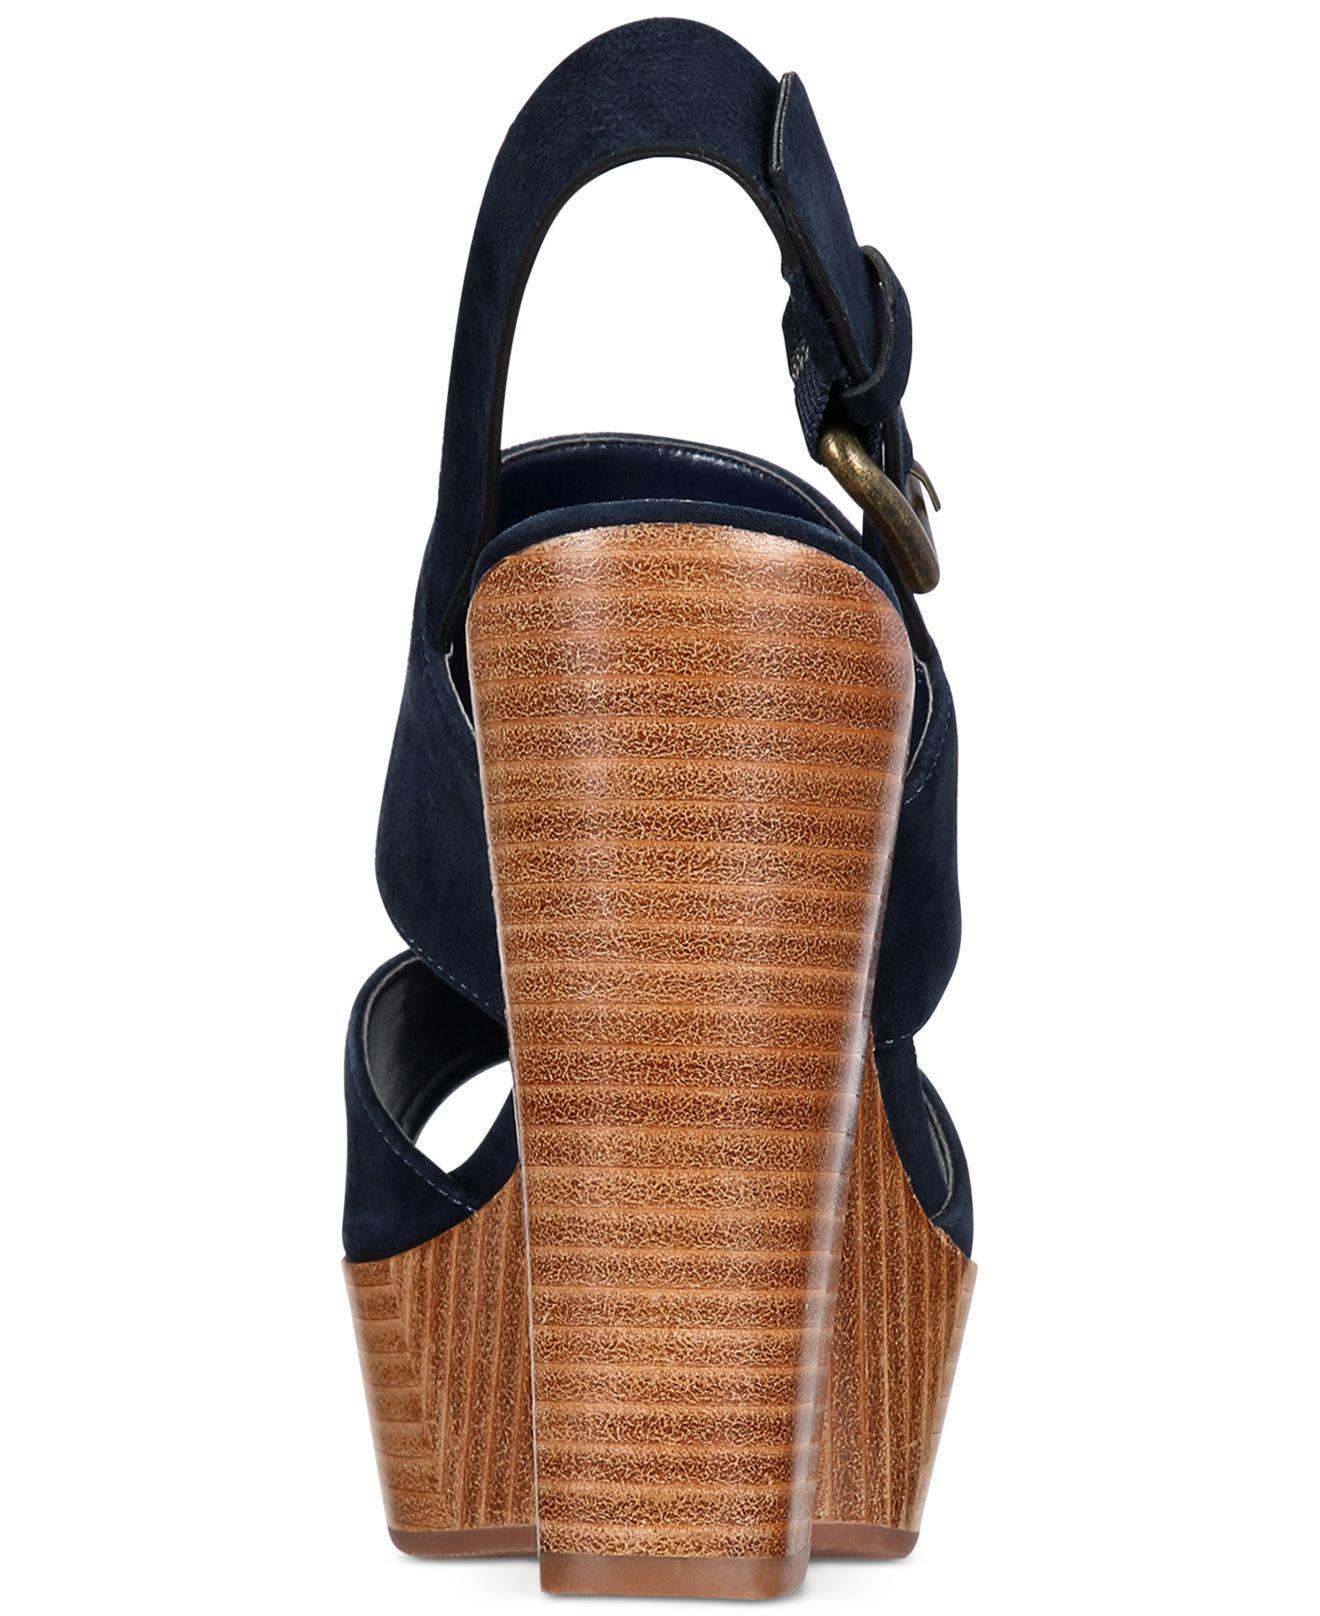 13a4051e1a ALDO Women's Maximoa Platform Block-heel Sandals in Blue - Lyst